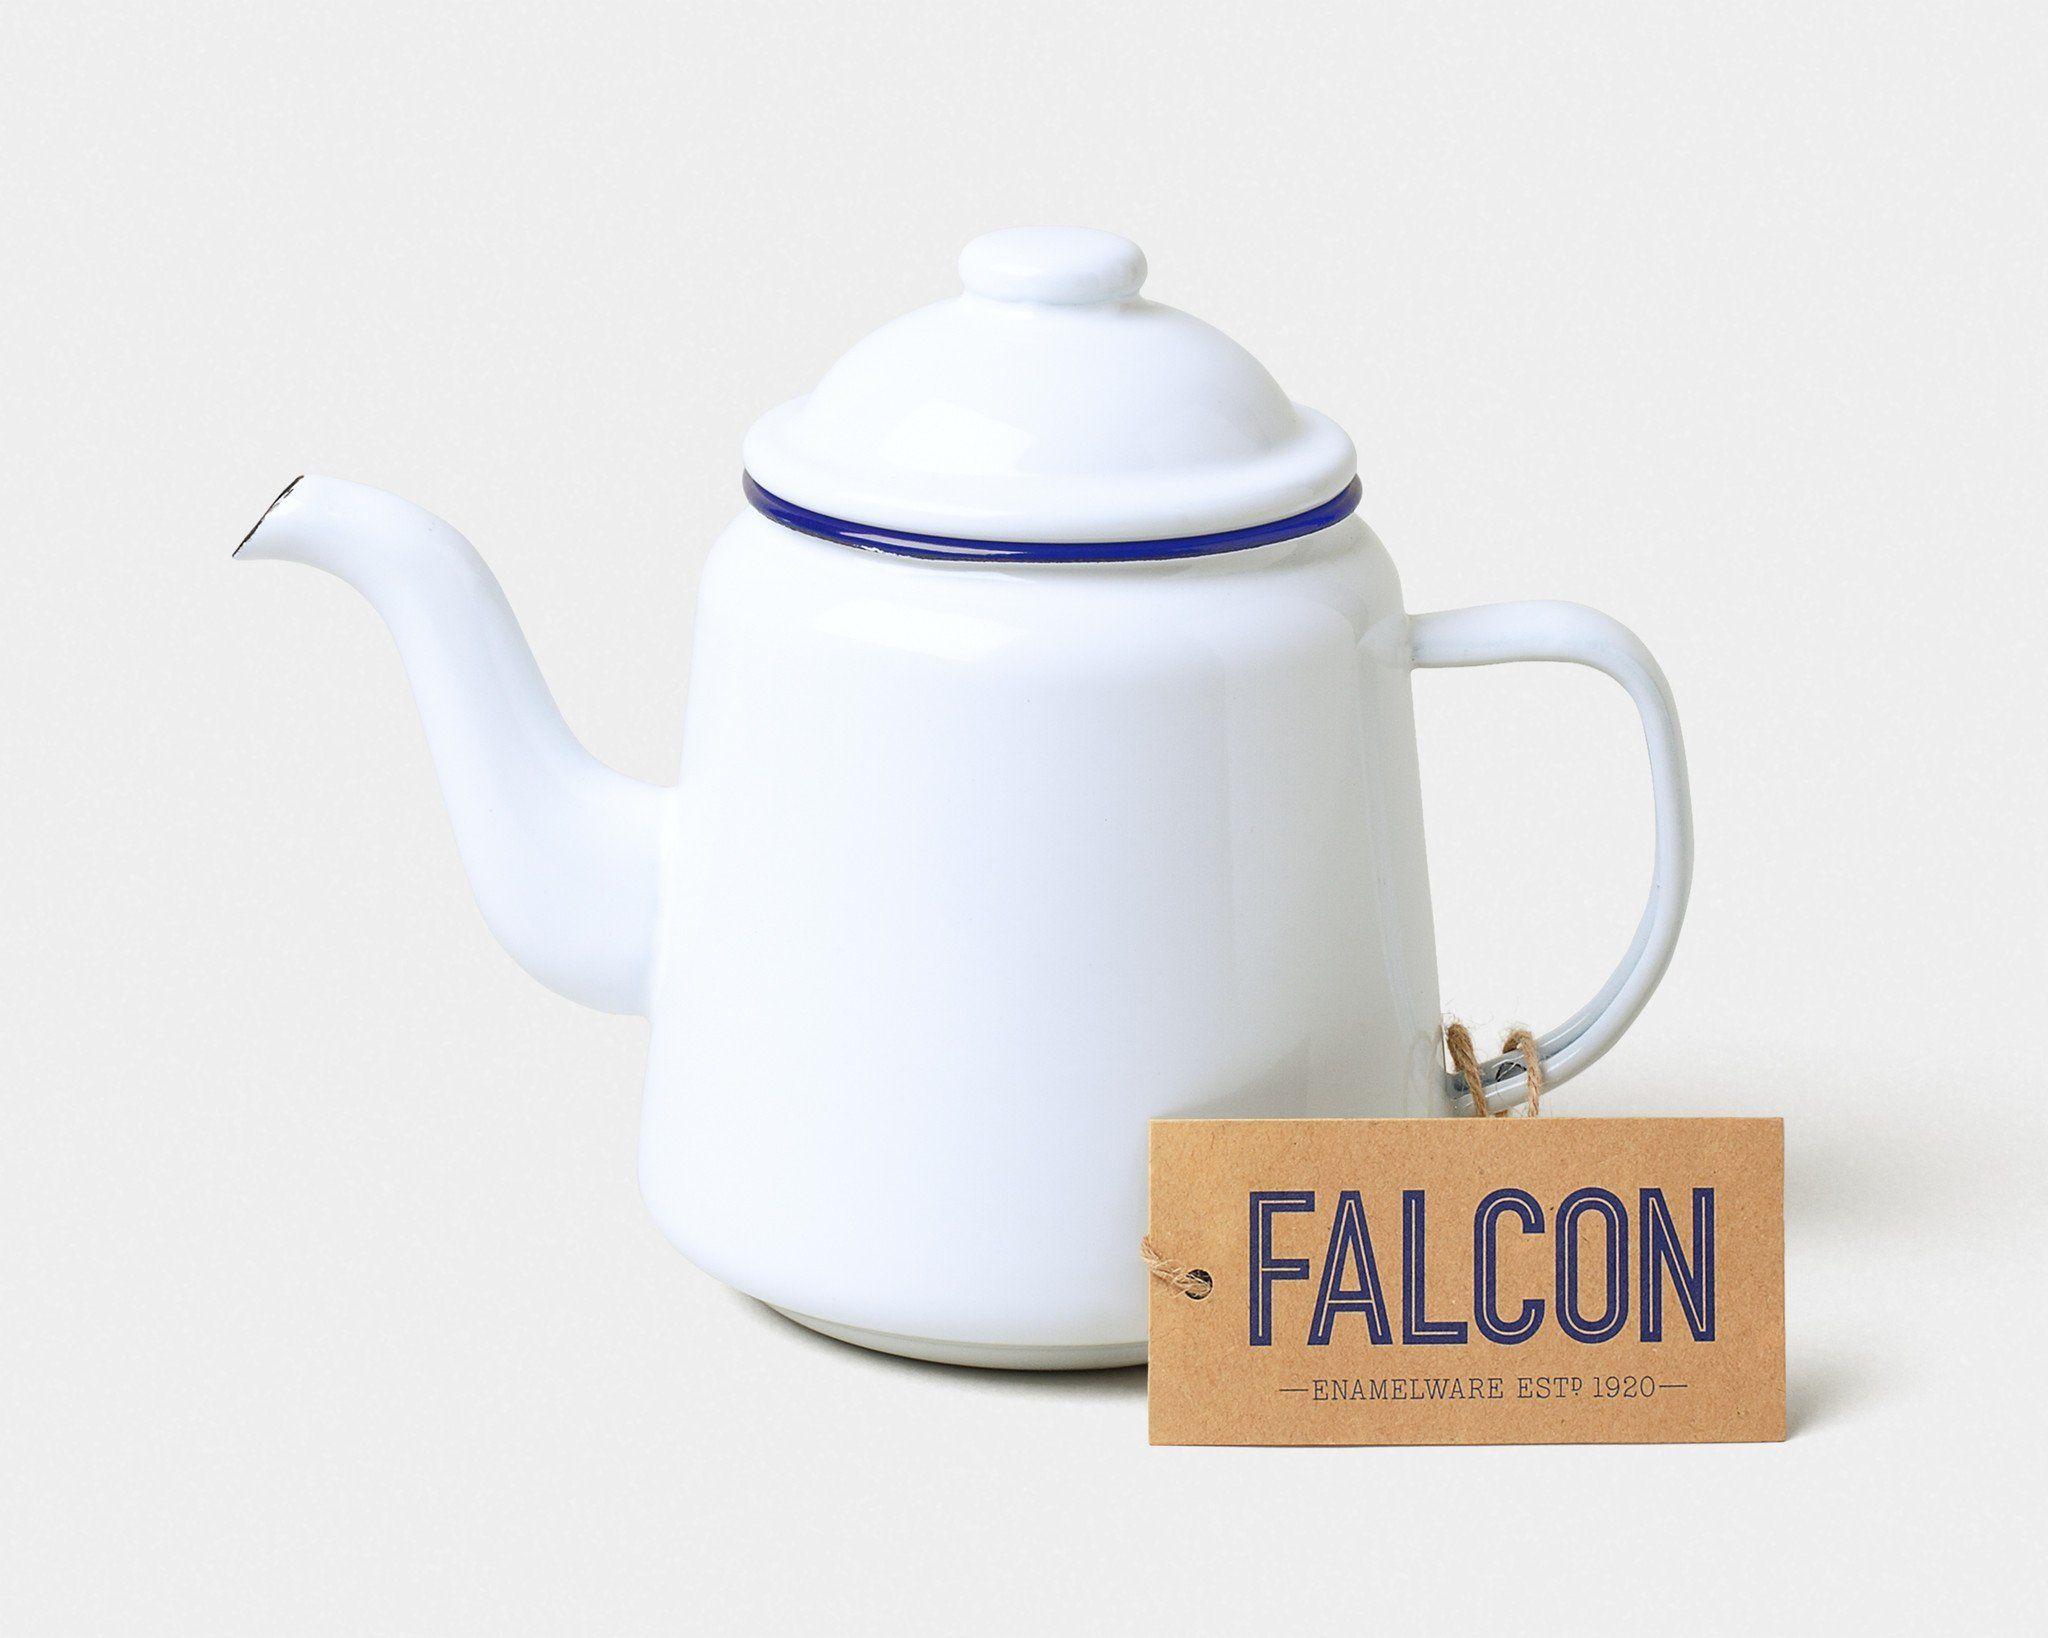 Falcon Enamelware 1L White Teapot - Trouva